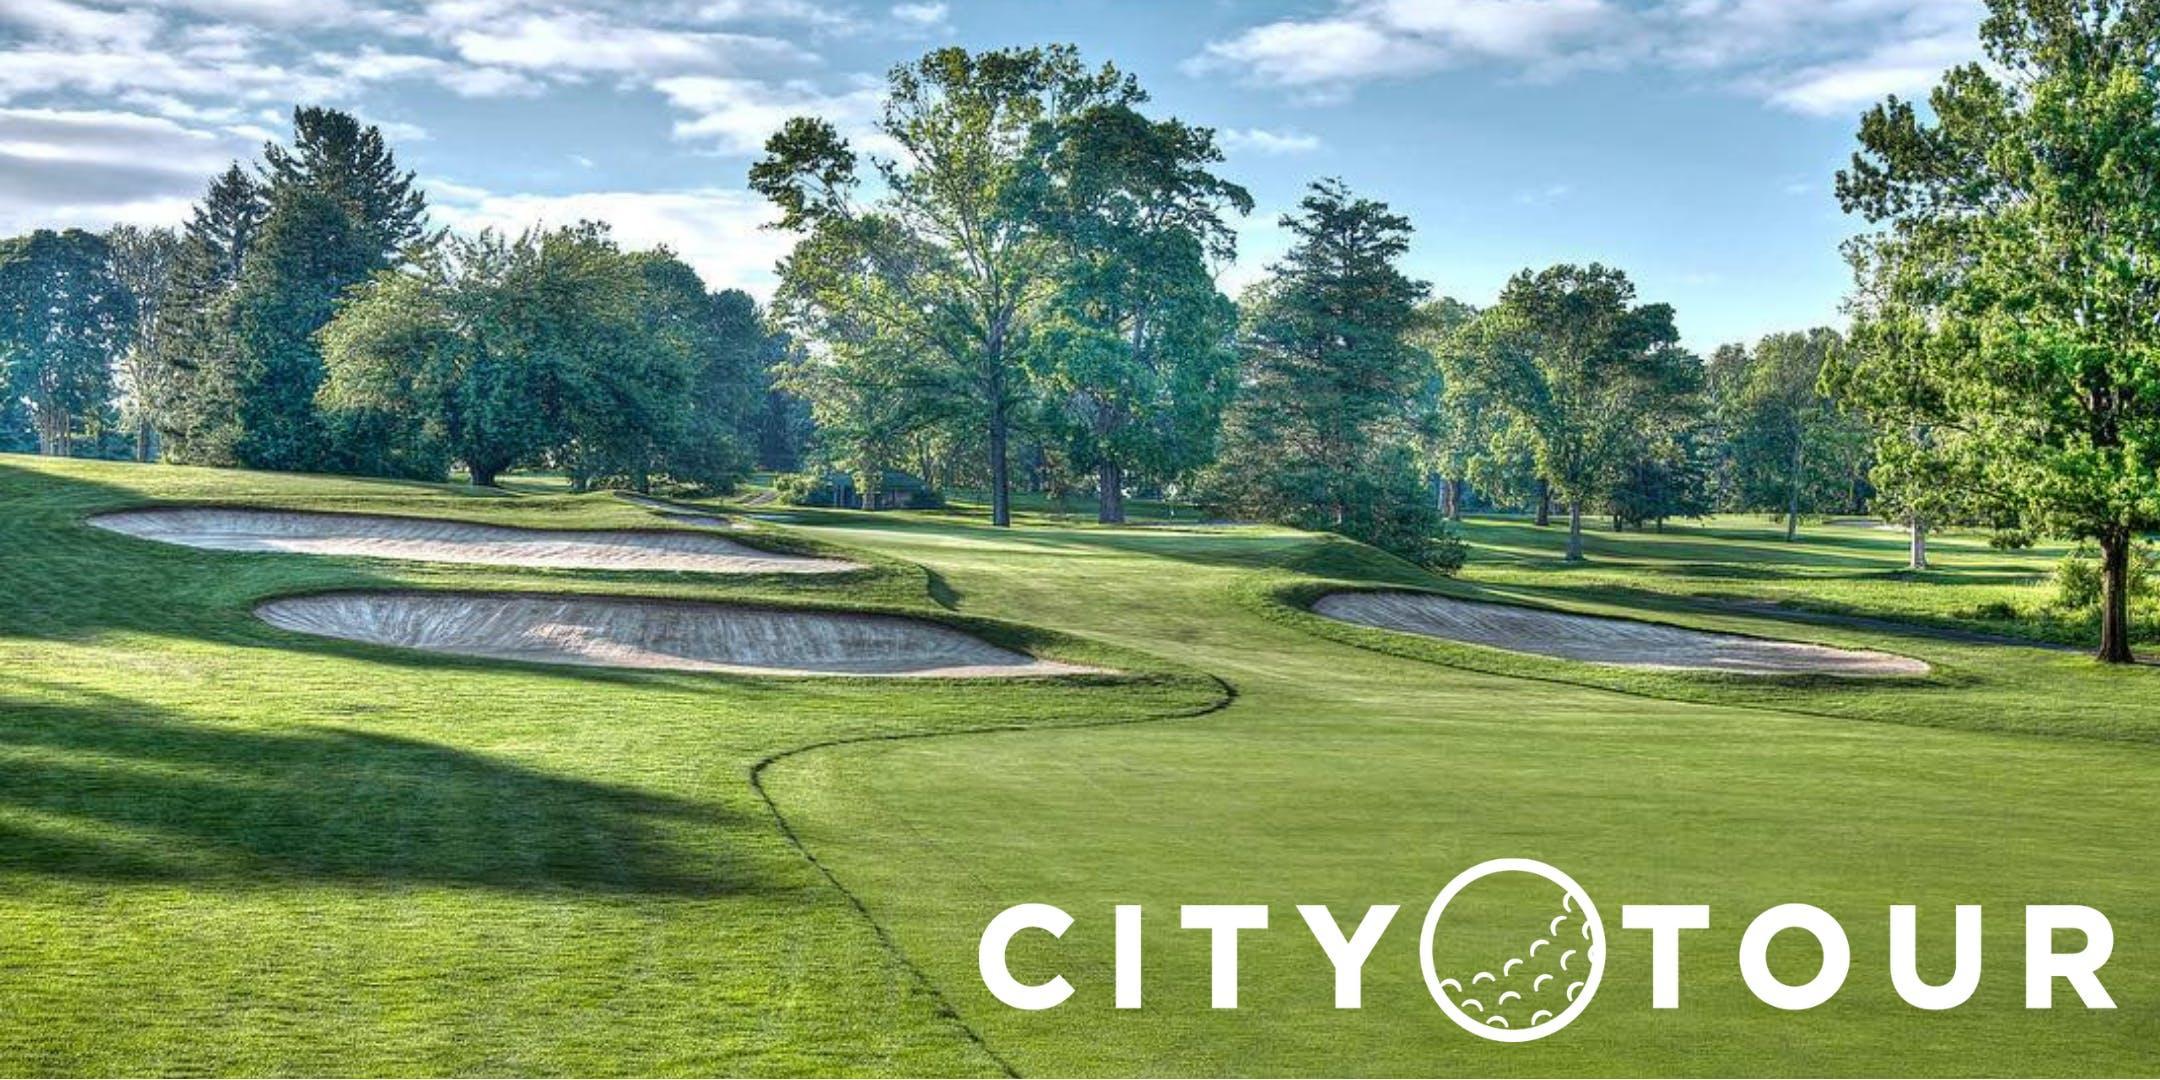 Houston City Tour - Wildcat Golf Club